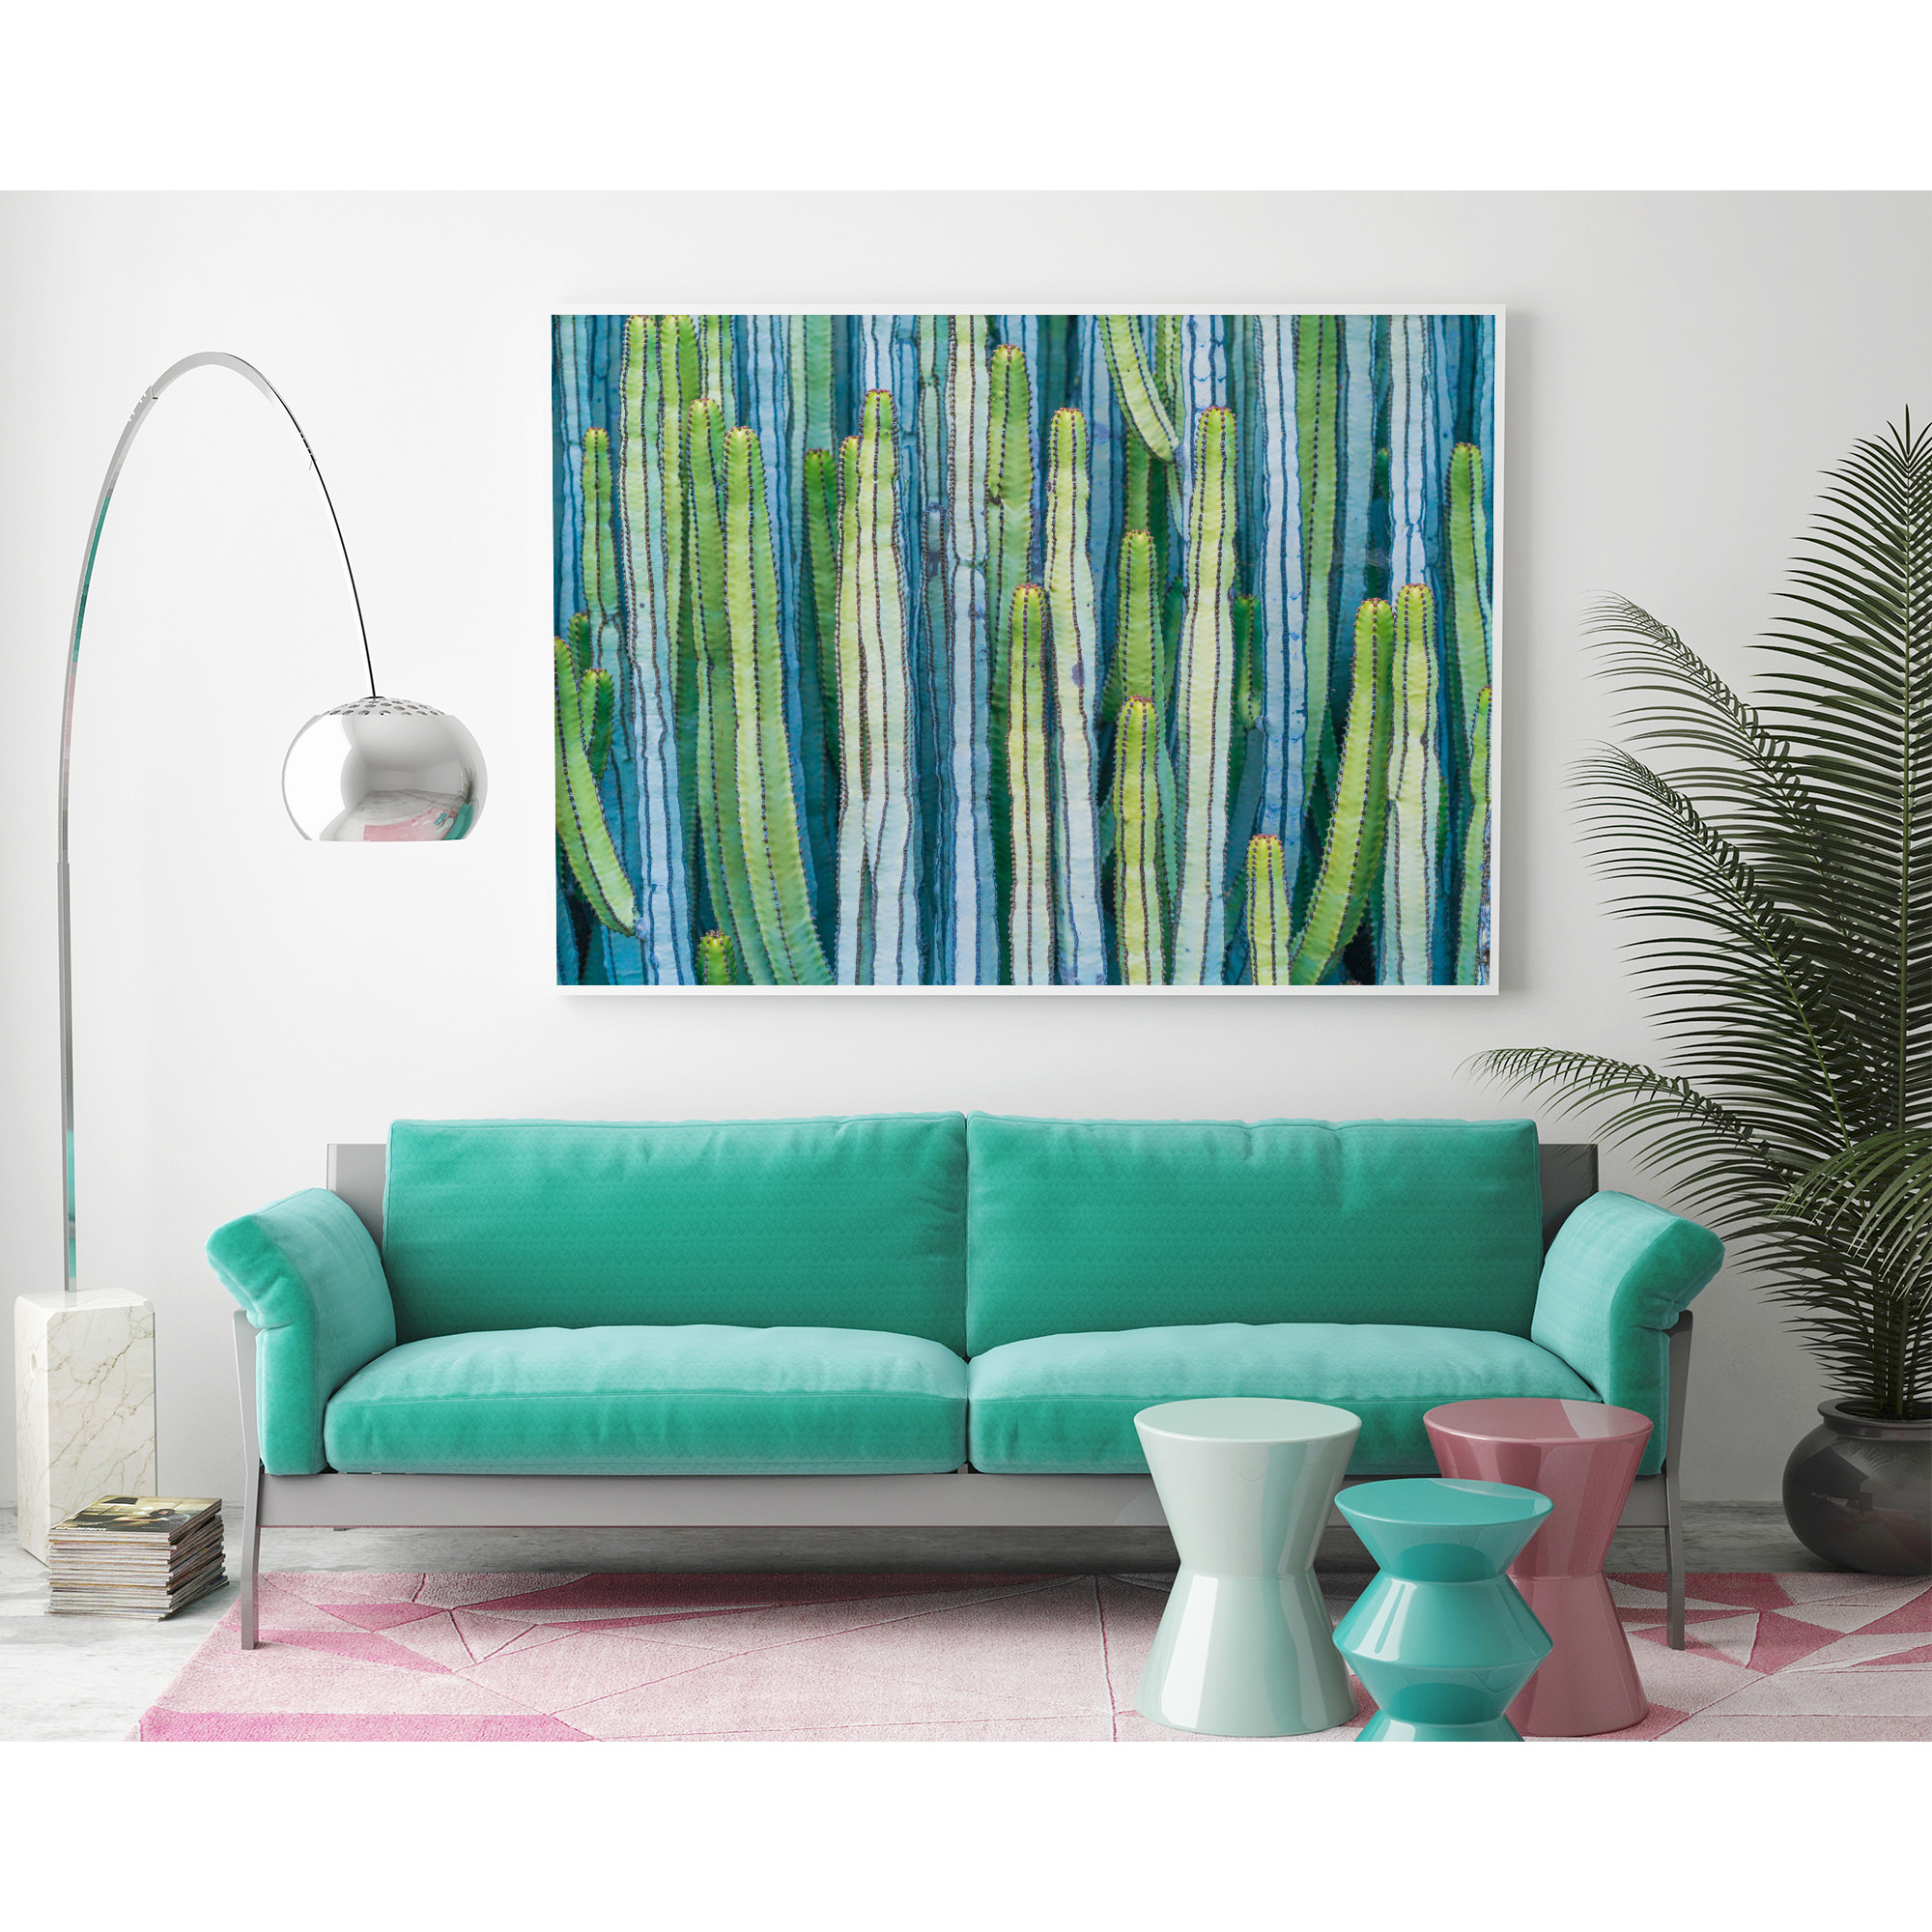 Image and artwork via  Atelier Lane